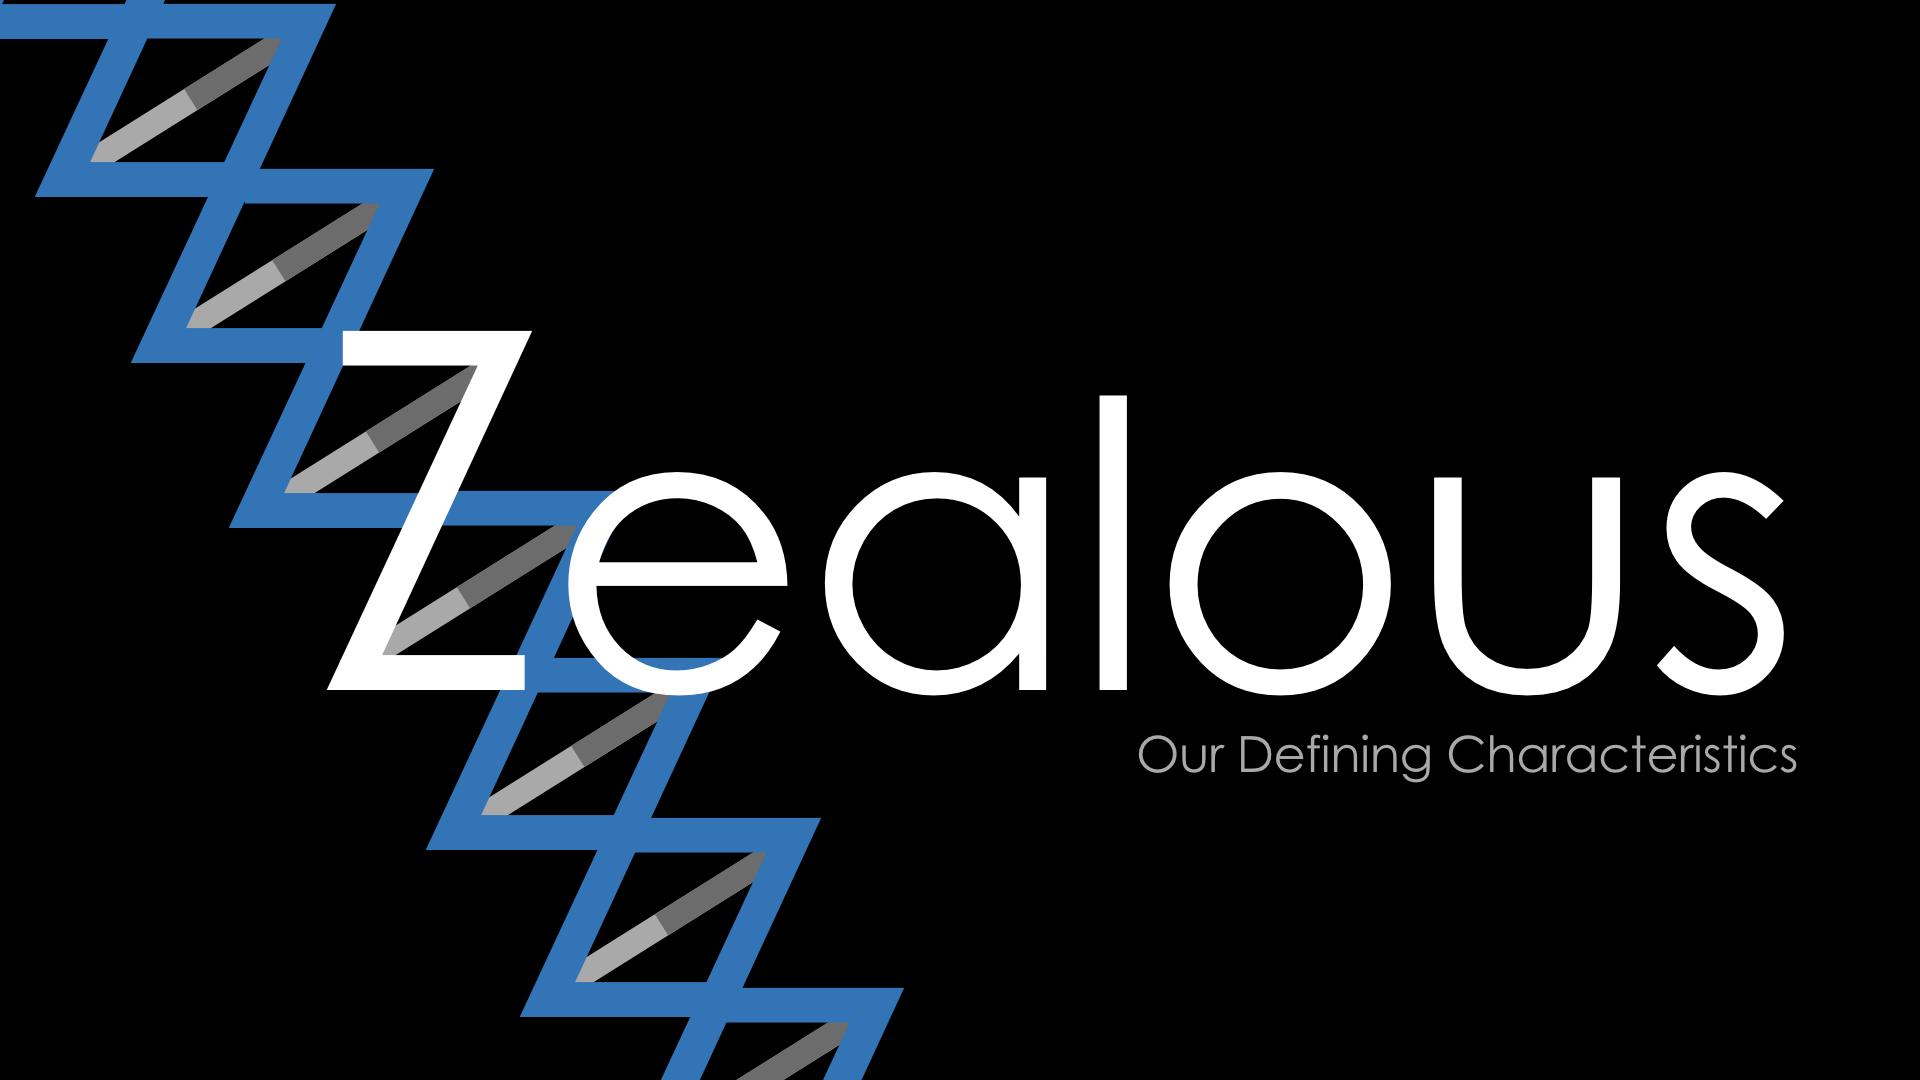 zealous images.001.jpeg